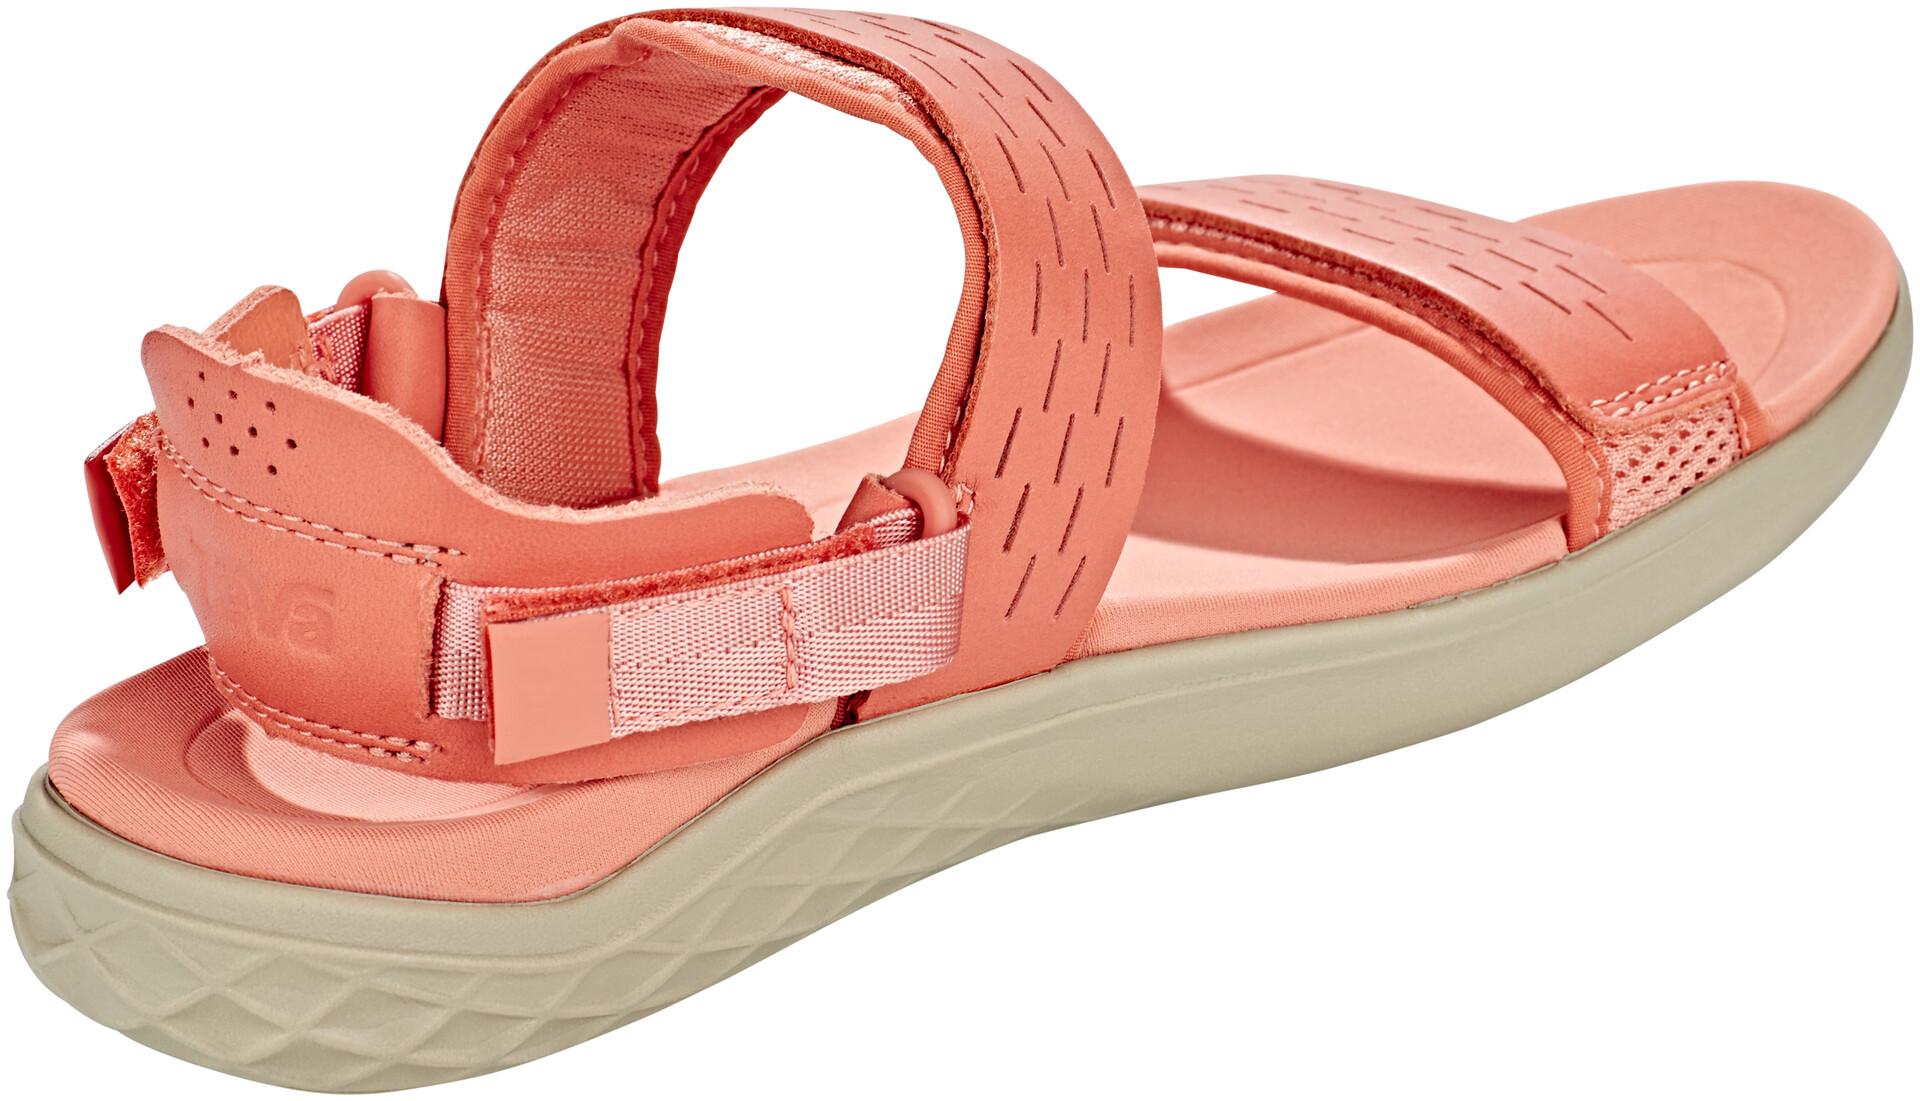 Teva Terra Float 2 Lux Nova Sandals Damen coral sand